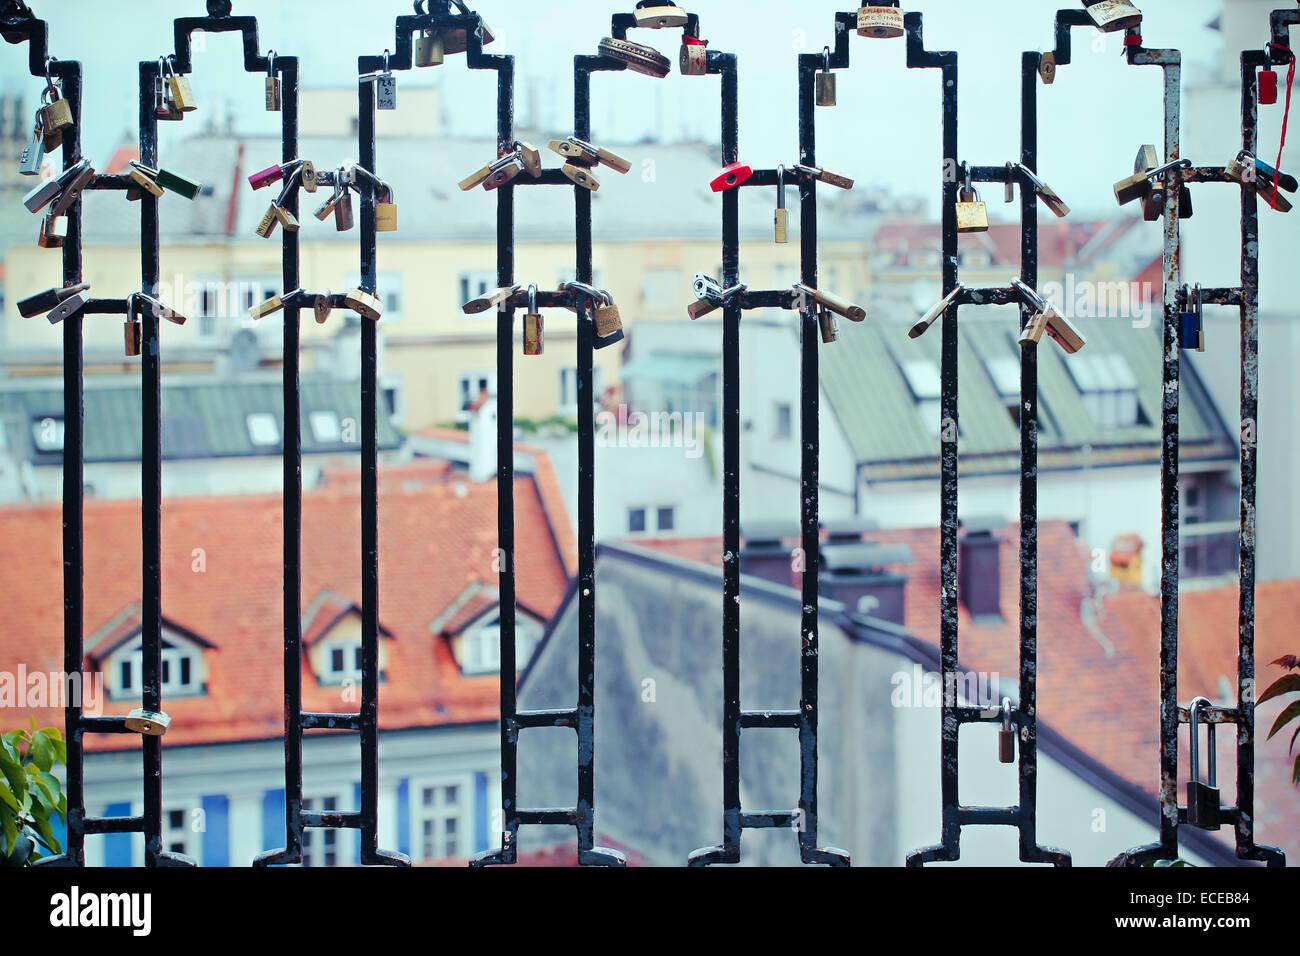 City skyline seen through railings, Zagreb, Croatia - Stock Image